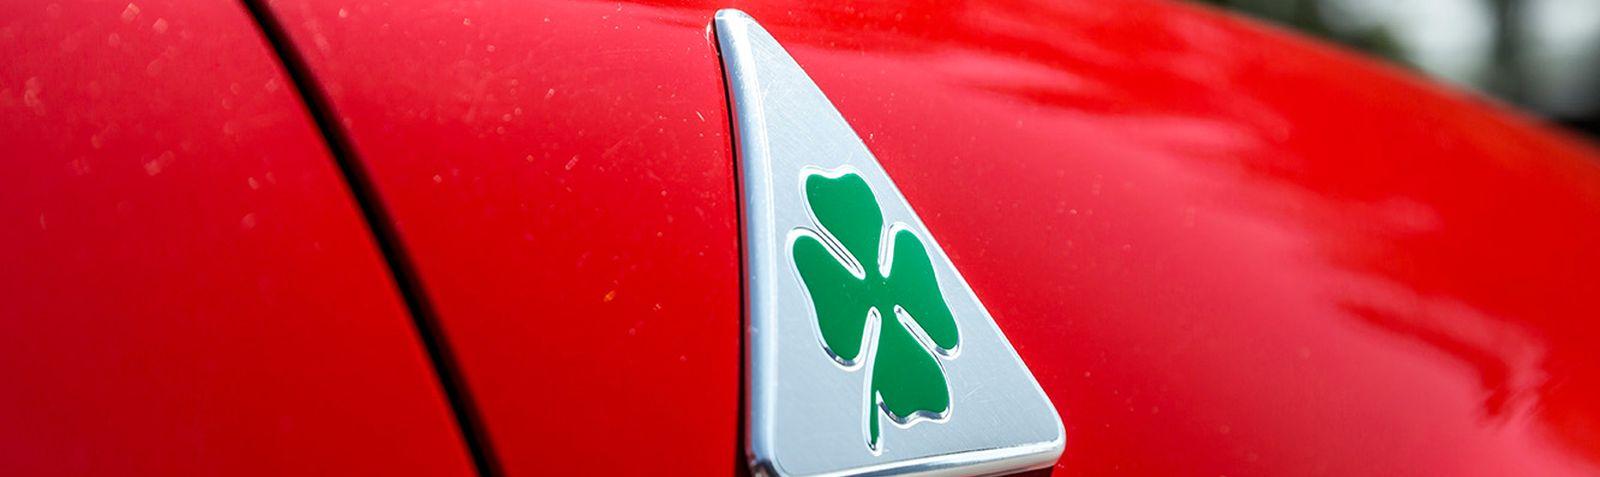 Trèfle Vert Alfa Romeo